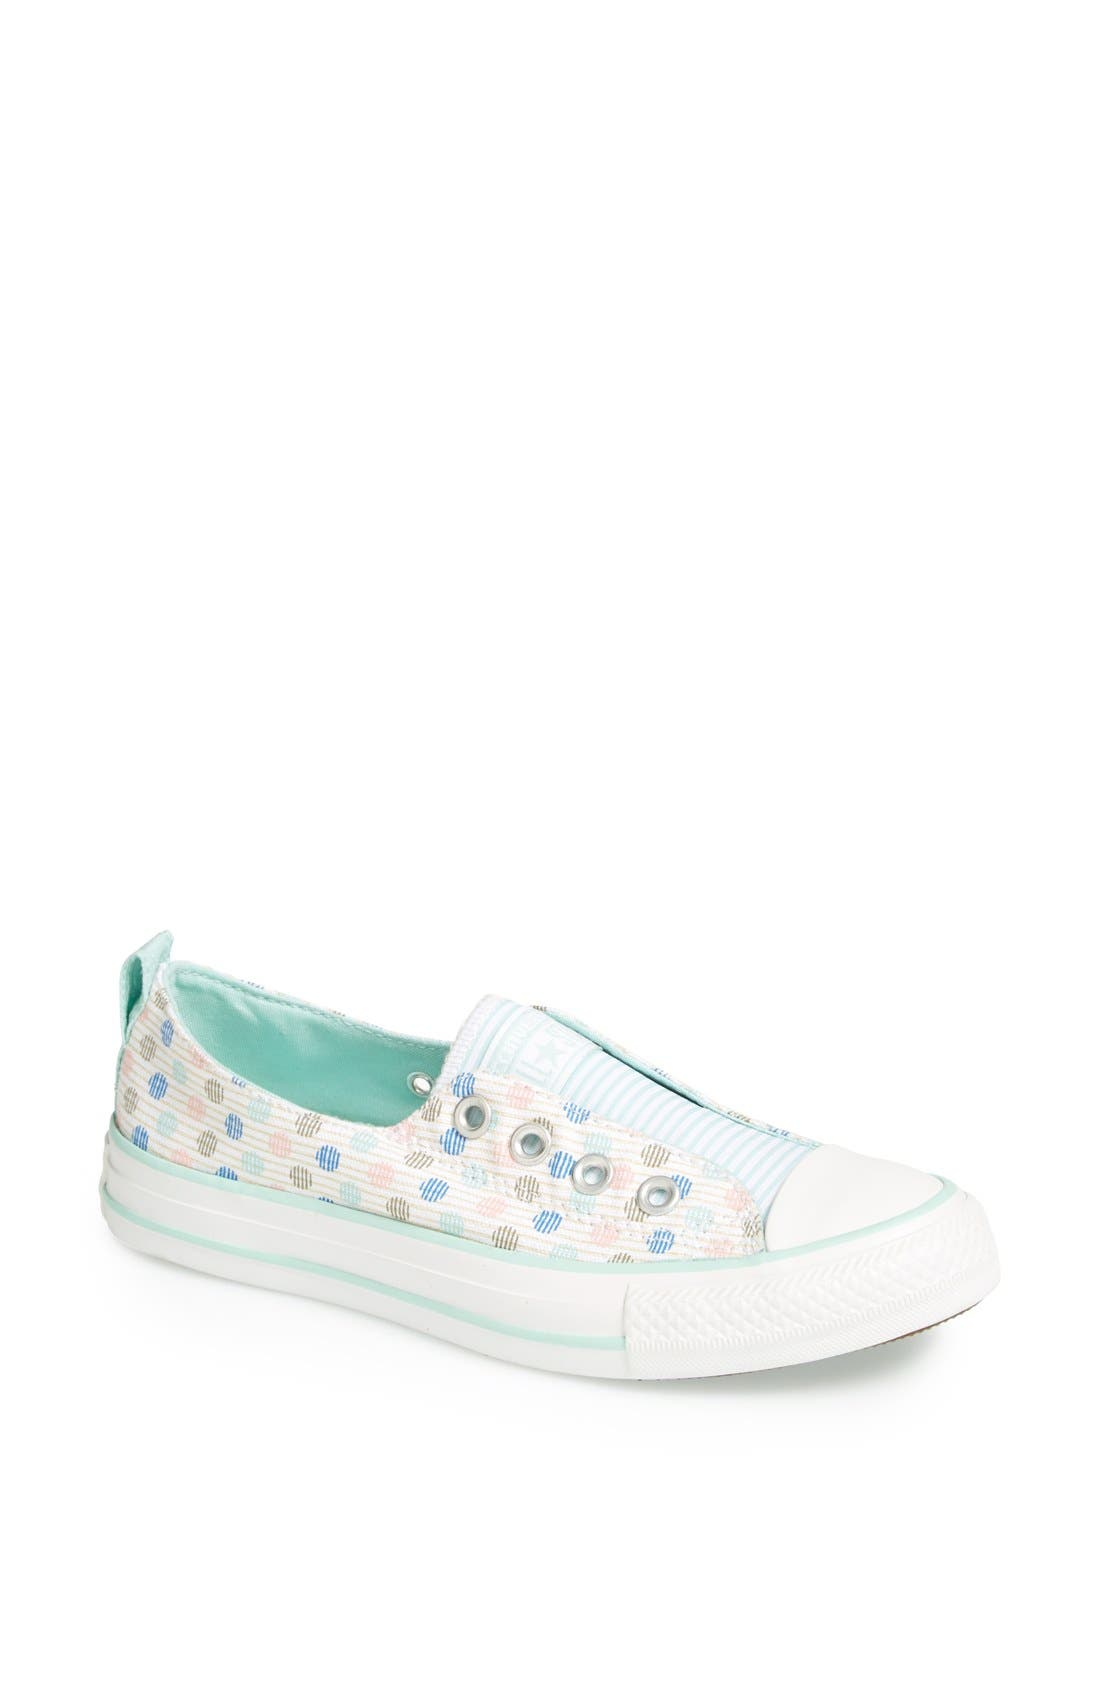 Alternate Image 1 Selected - Converse Chuck Taylor® All Star® Polka Dot Sneaker